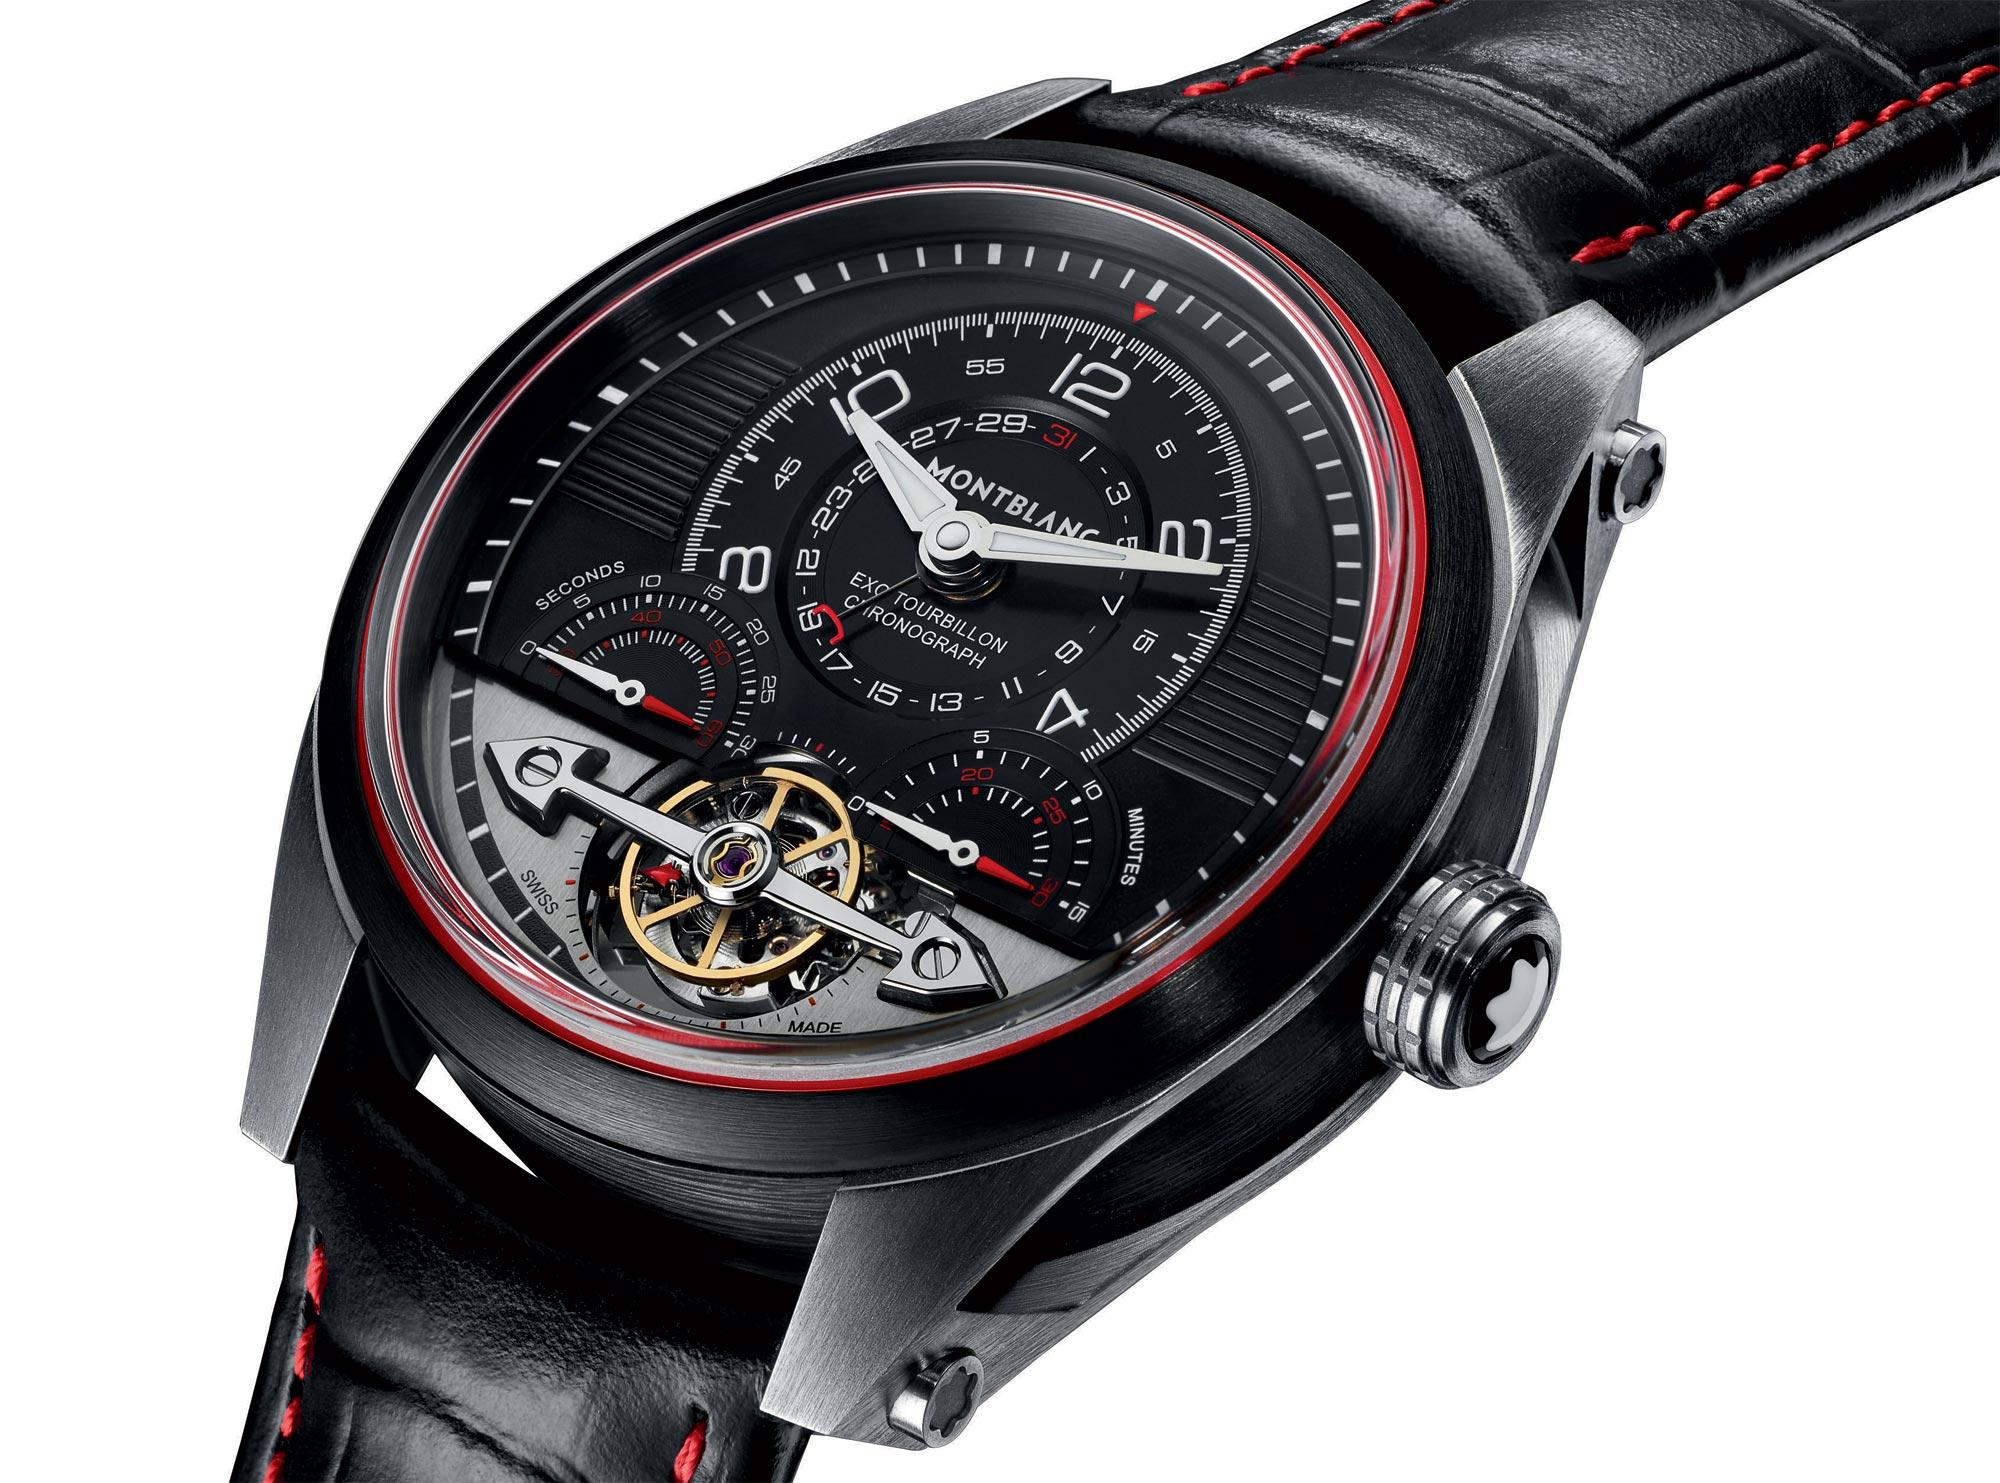 Montblanc Timewalker Exotourbillon Minute Chonograph Limited Edition 100